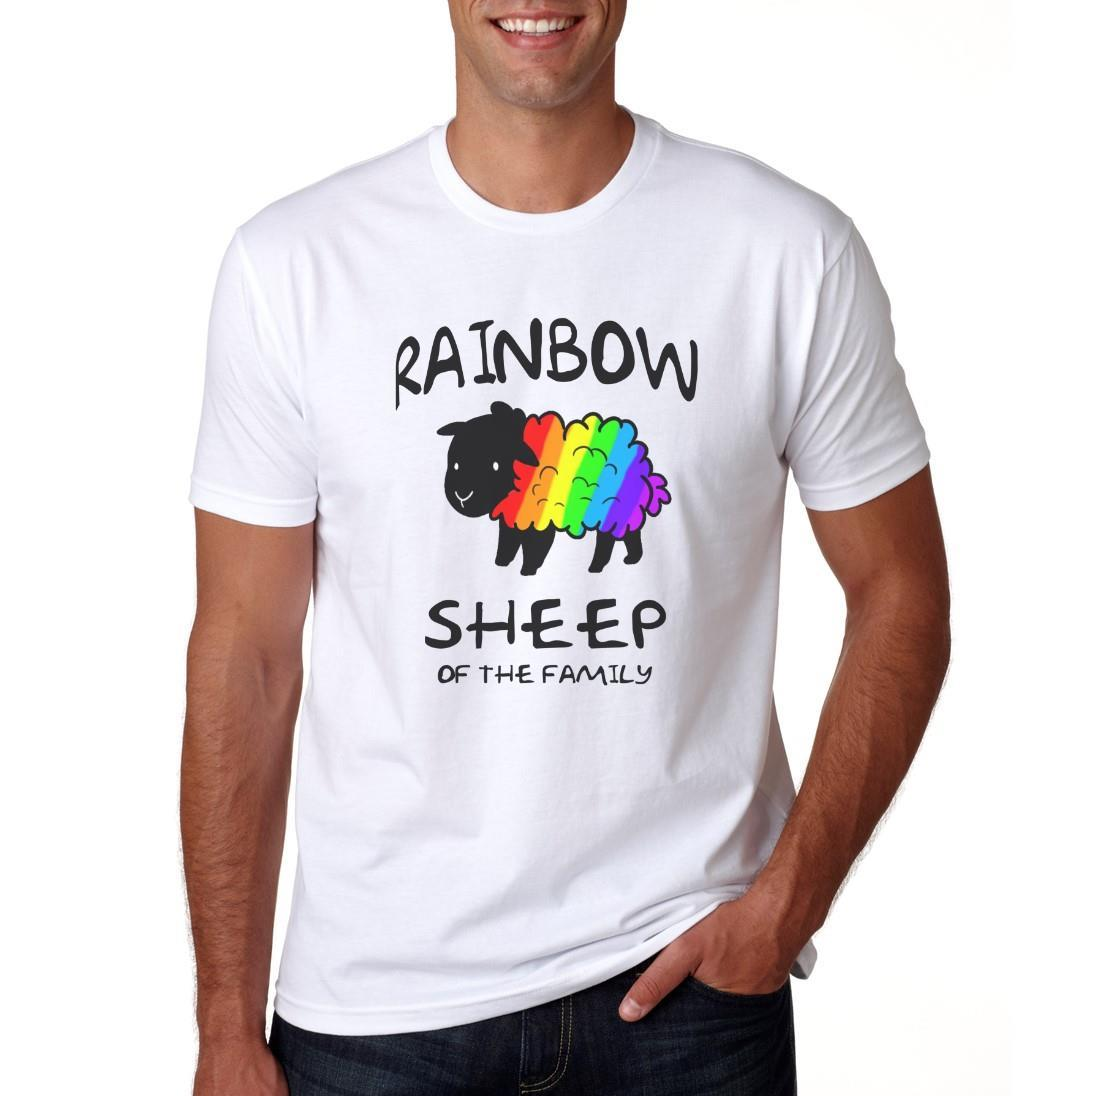 Of Para The Family Lgbt Compre Rainbow Camiseta Hombre Sheep qUtTwOwF